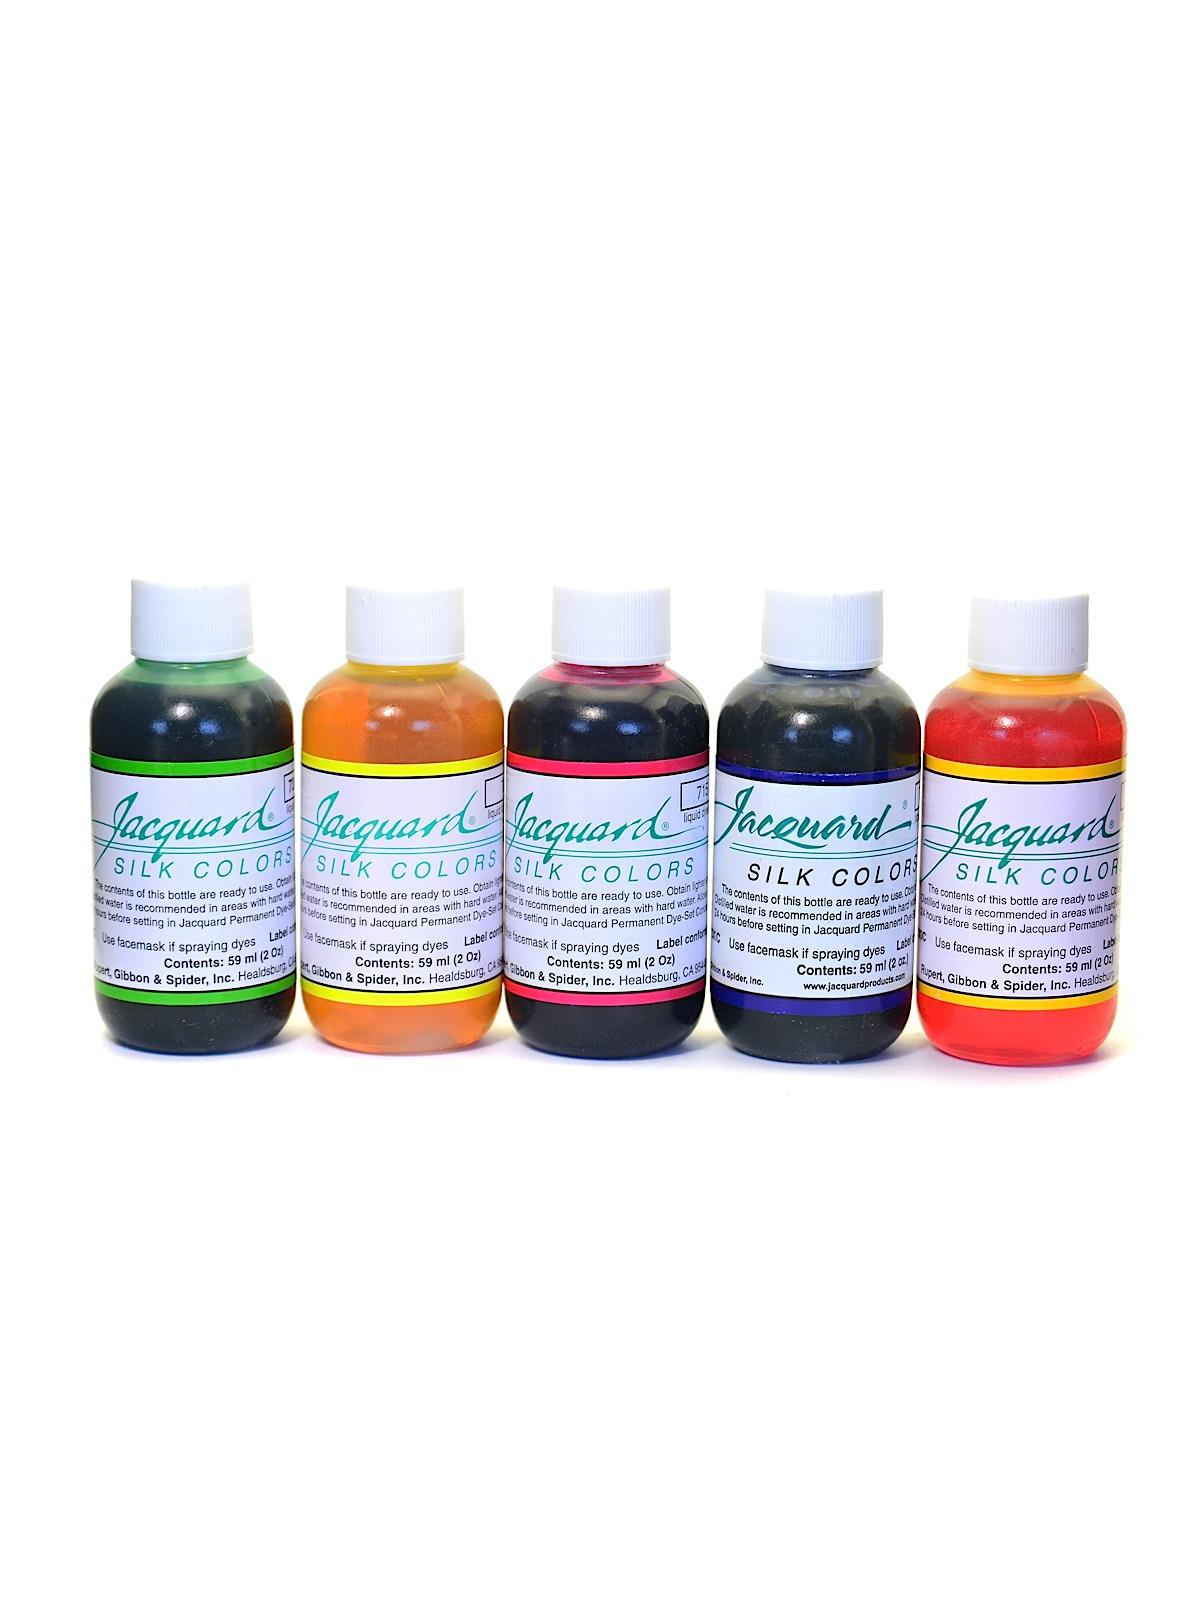 Jacquard - Green Label Silk Colors